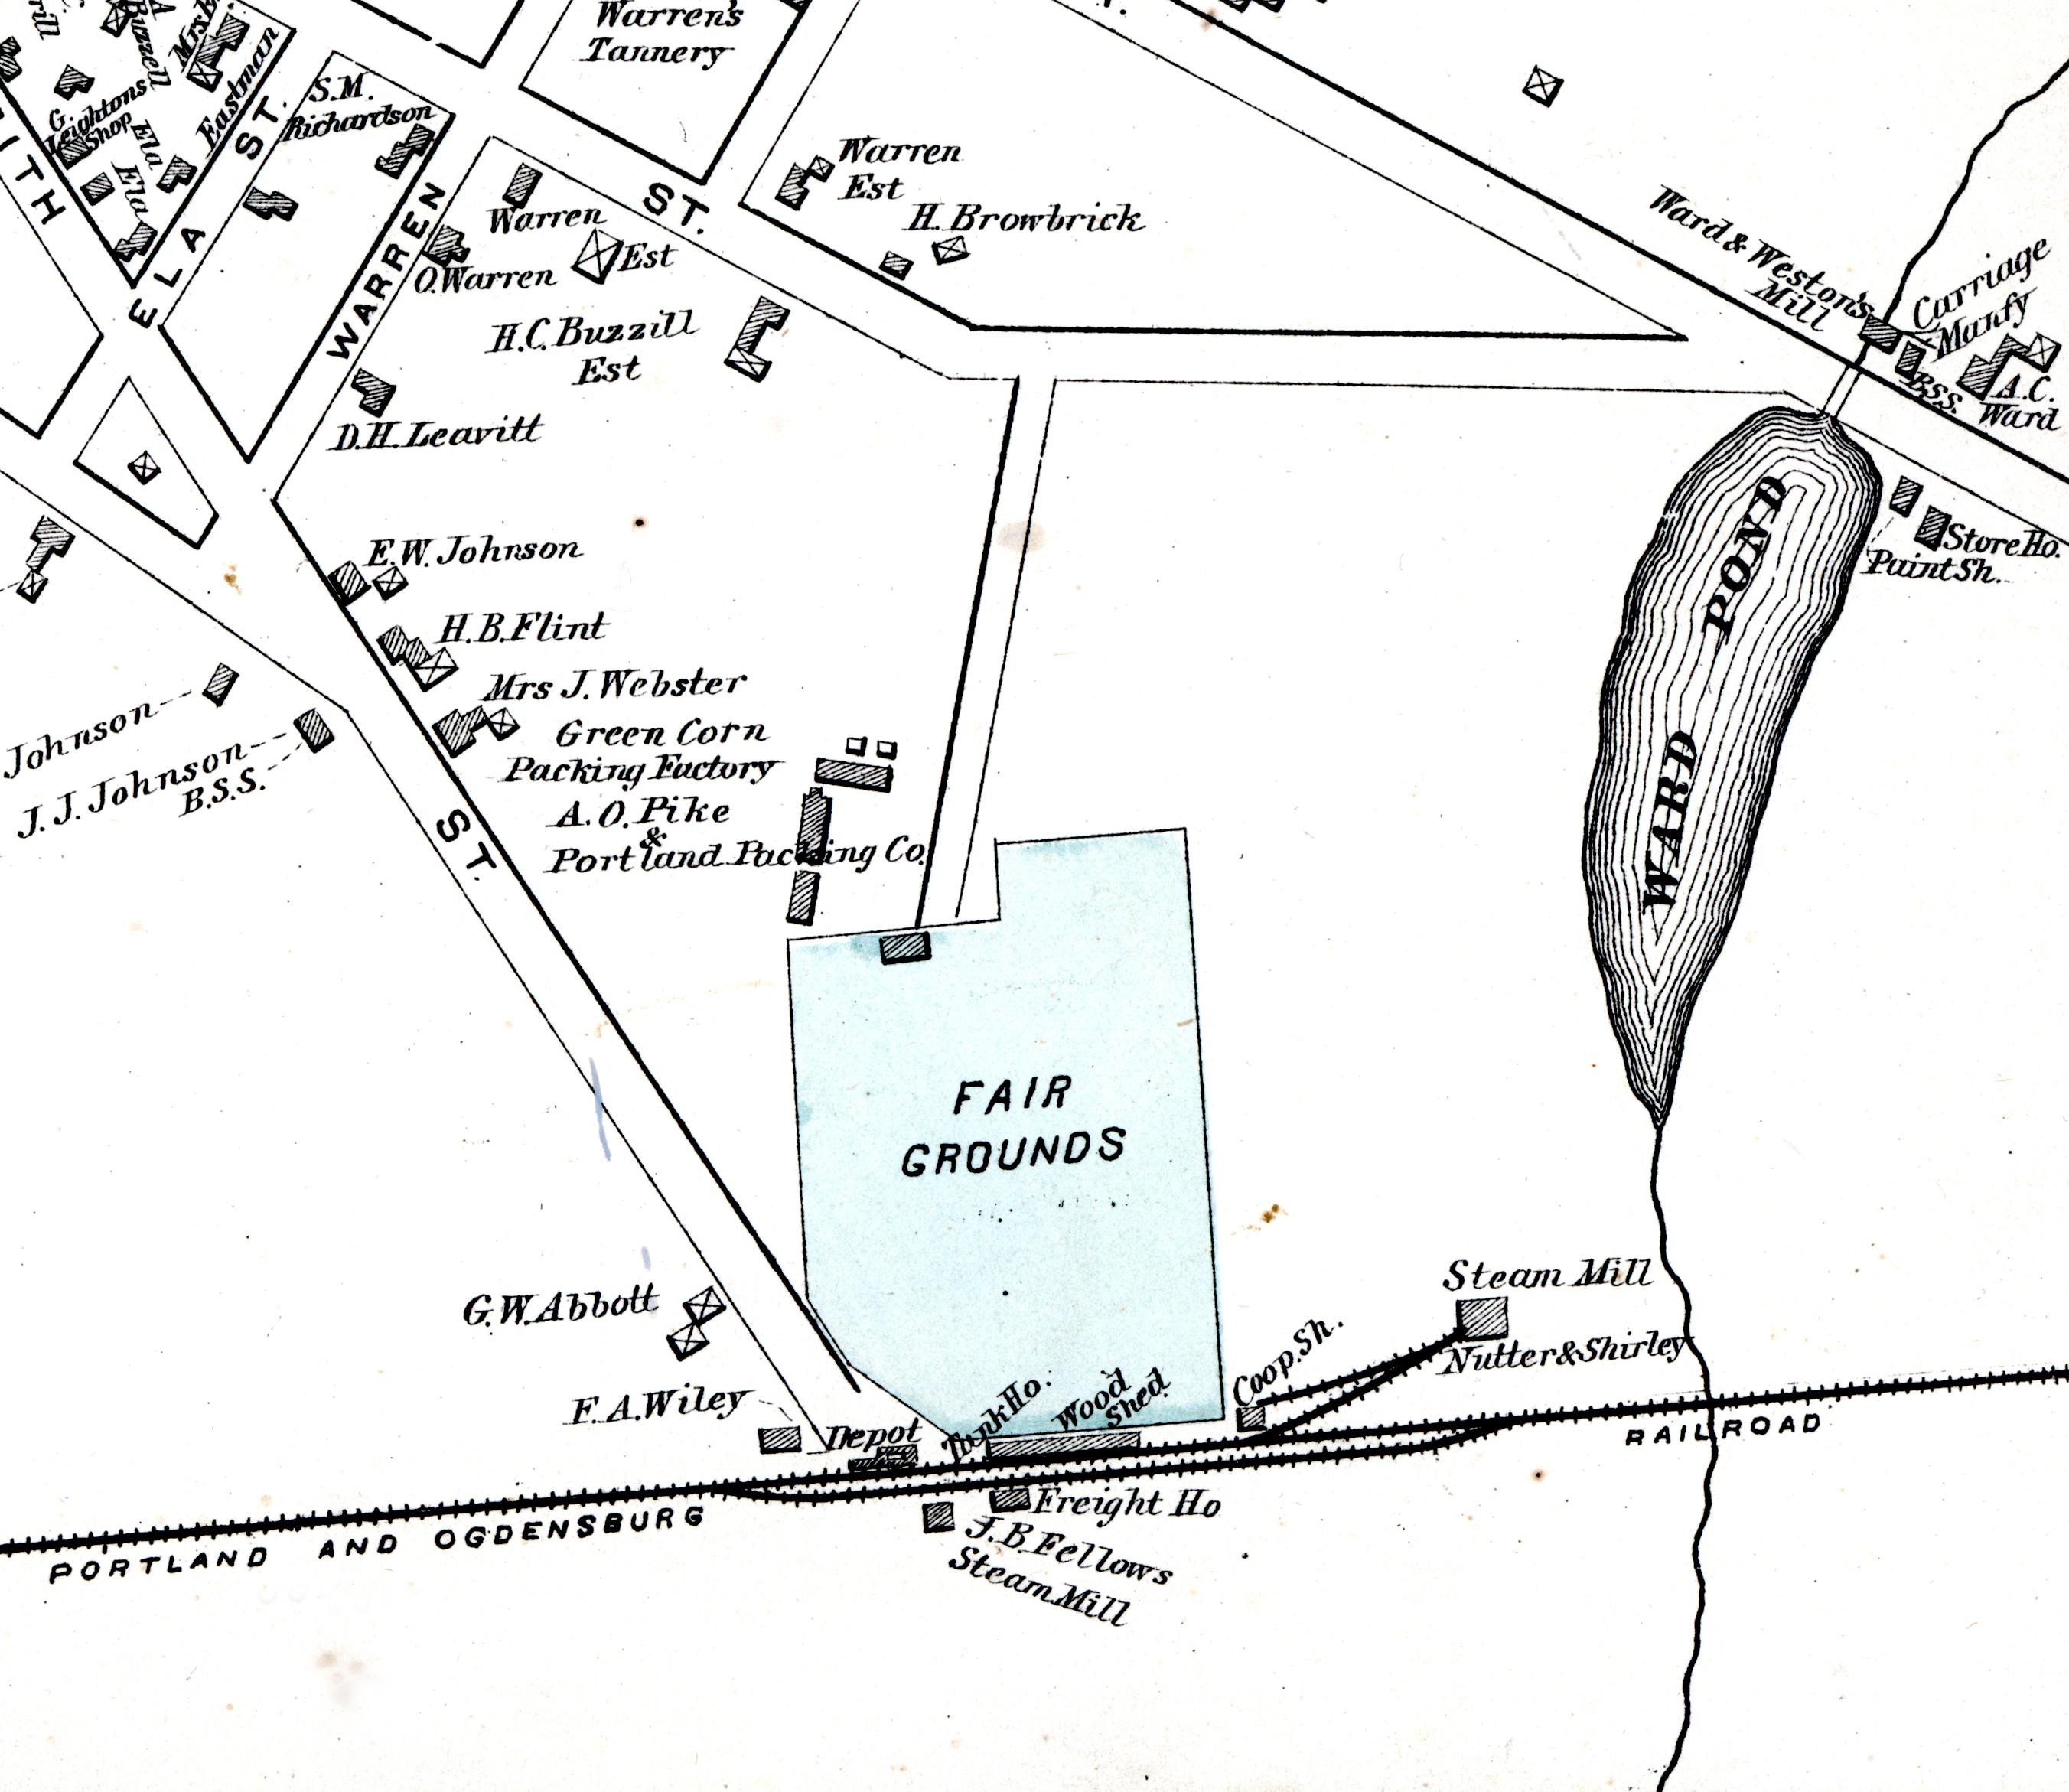 The Original Fairgrounds in the Village of Fryeburg, Maine